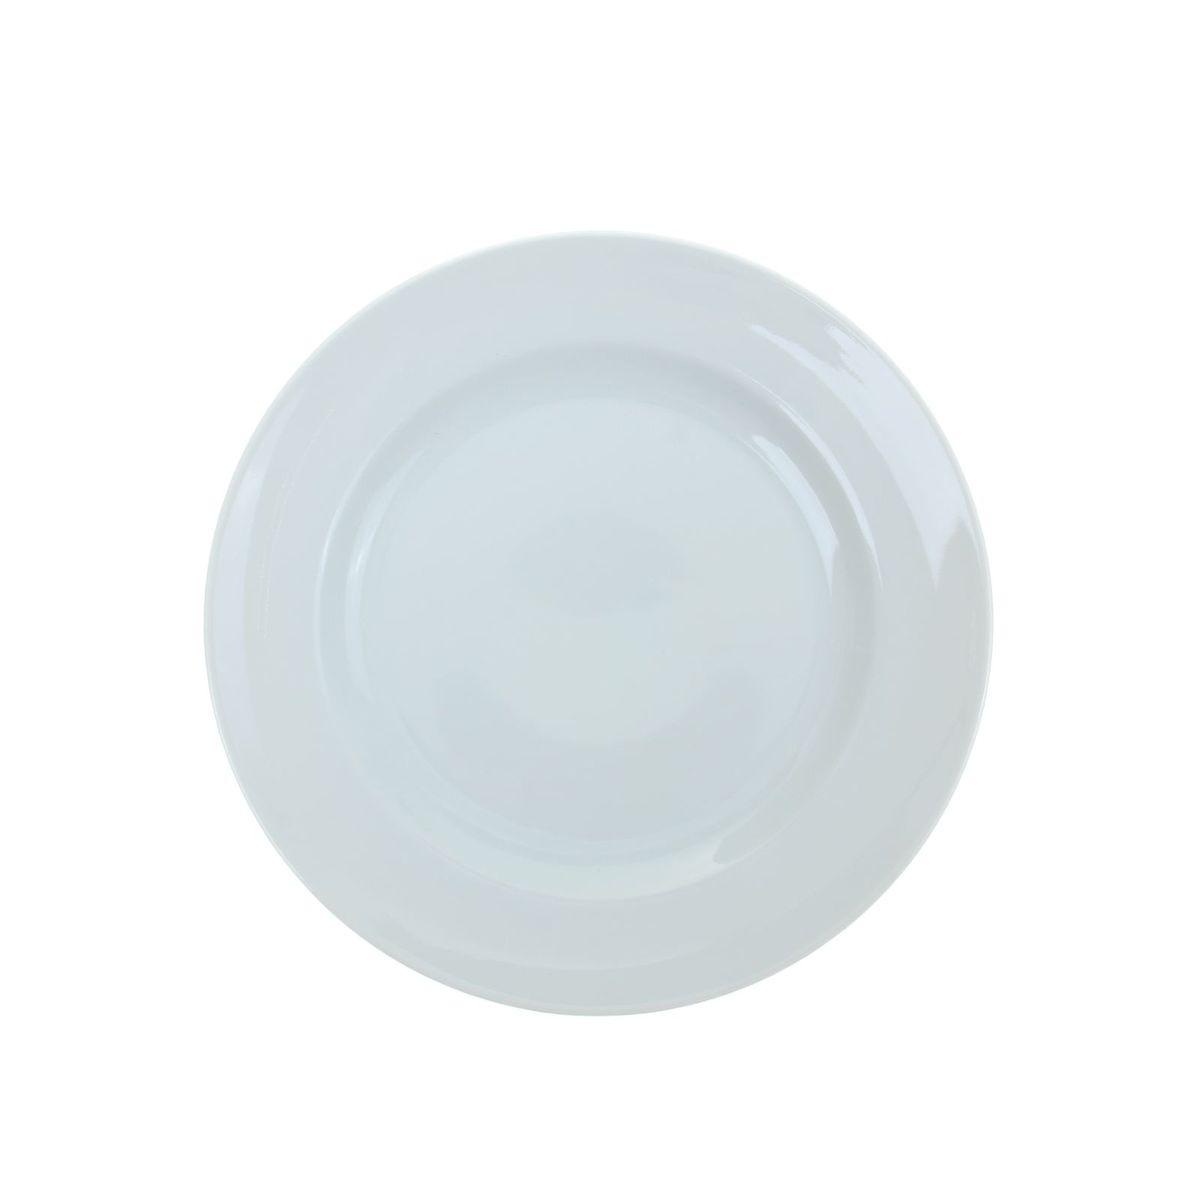 Тарелка мелкая Идиллия. Белье, диаметр 24 см1035427